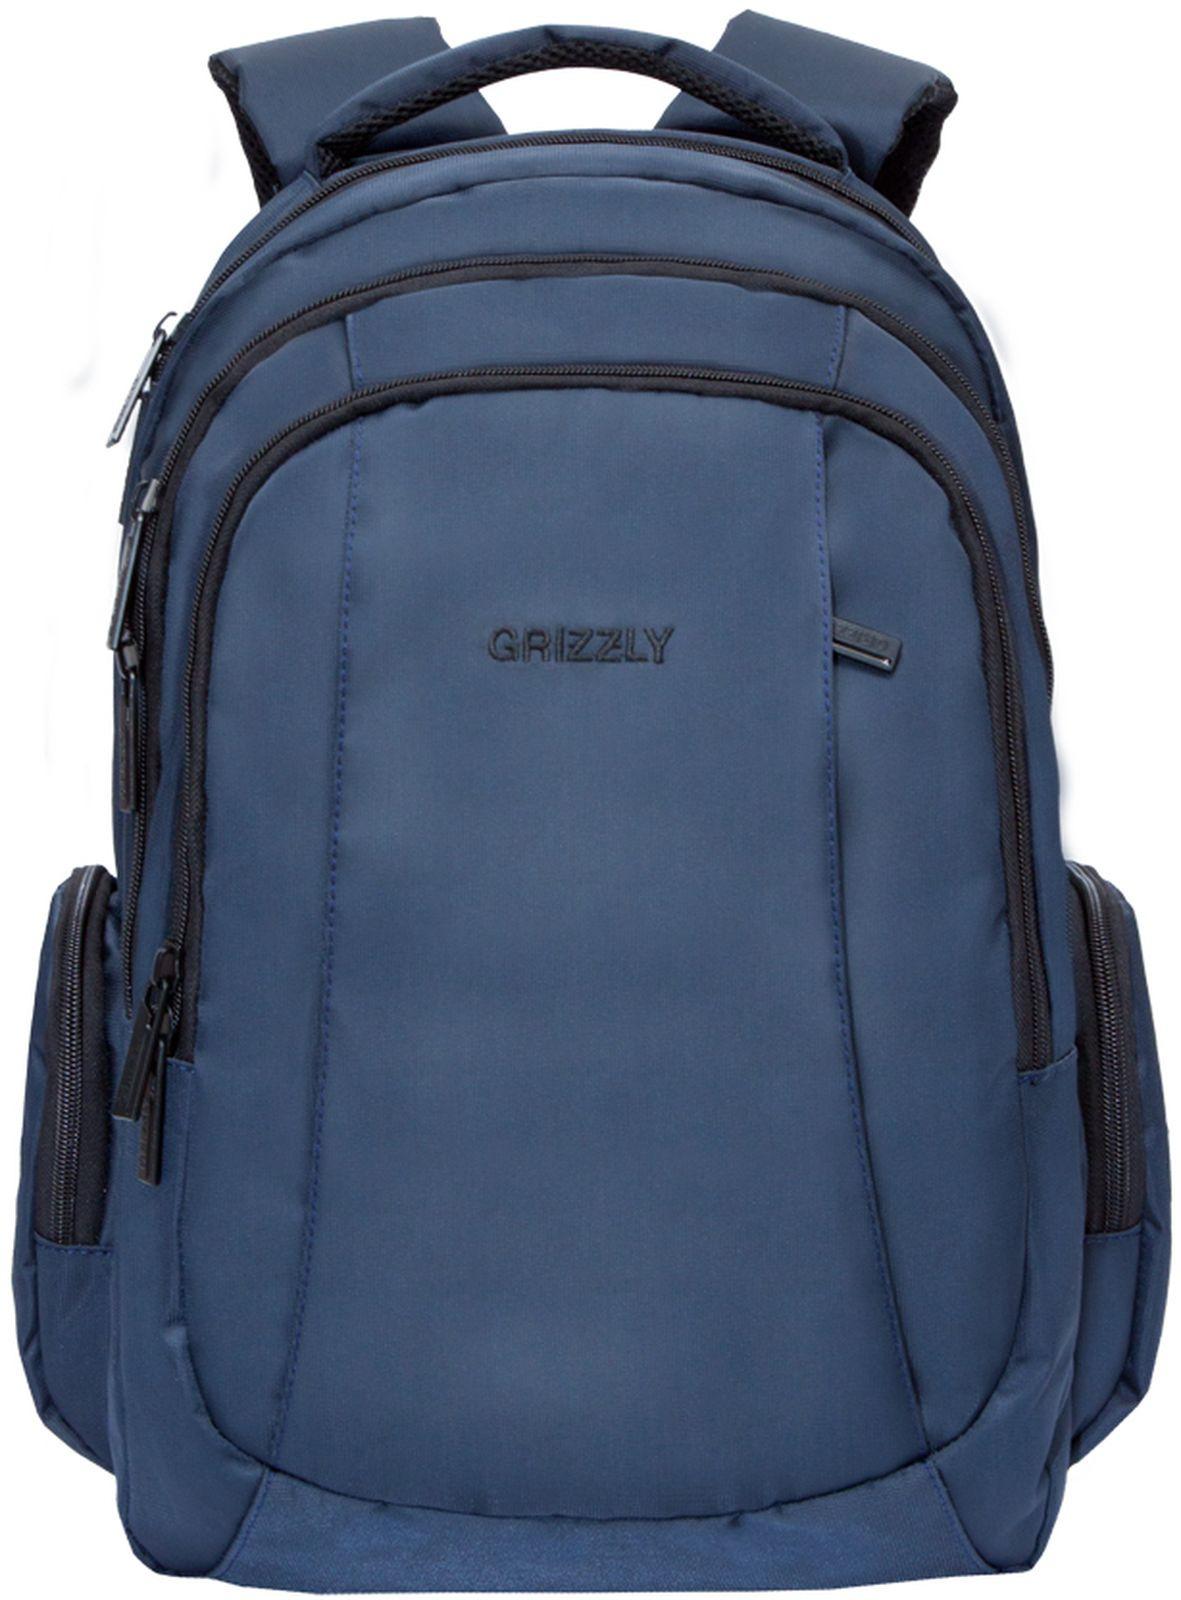 Рюкзак Grizzly, RU-934-2/2, синий рюкзак молодежный grizzly 16 л ru 808 2 2